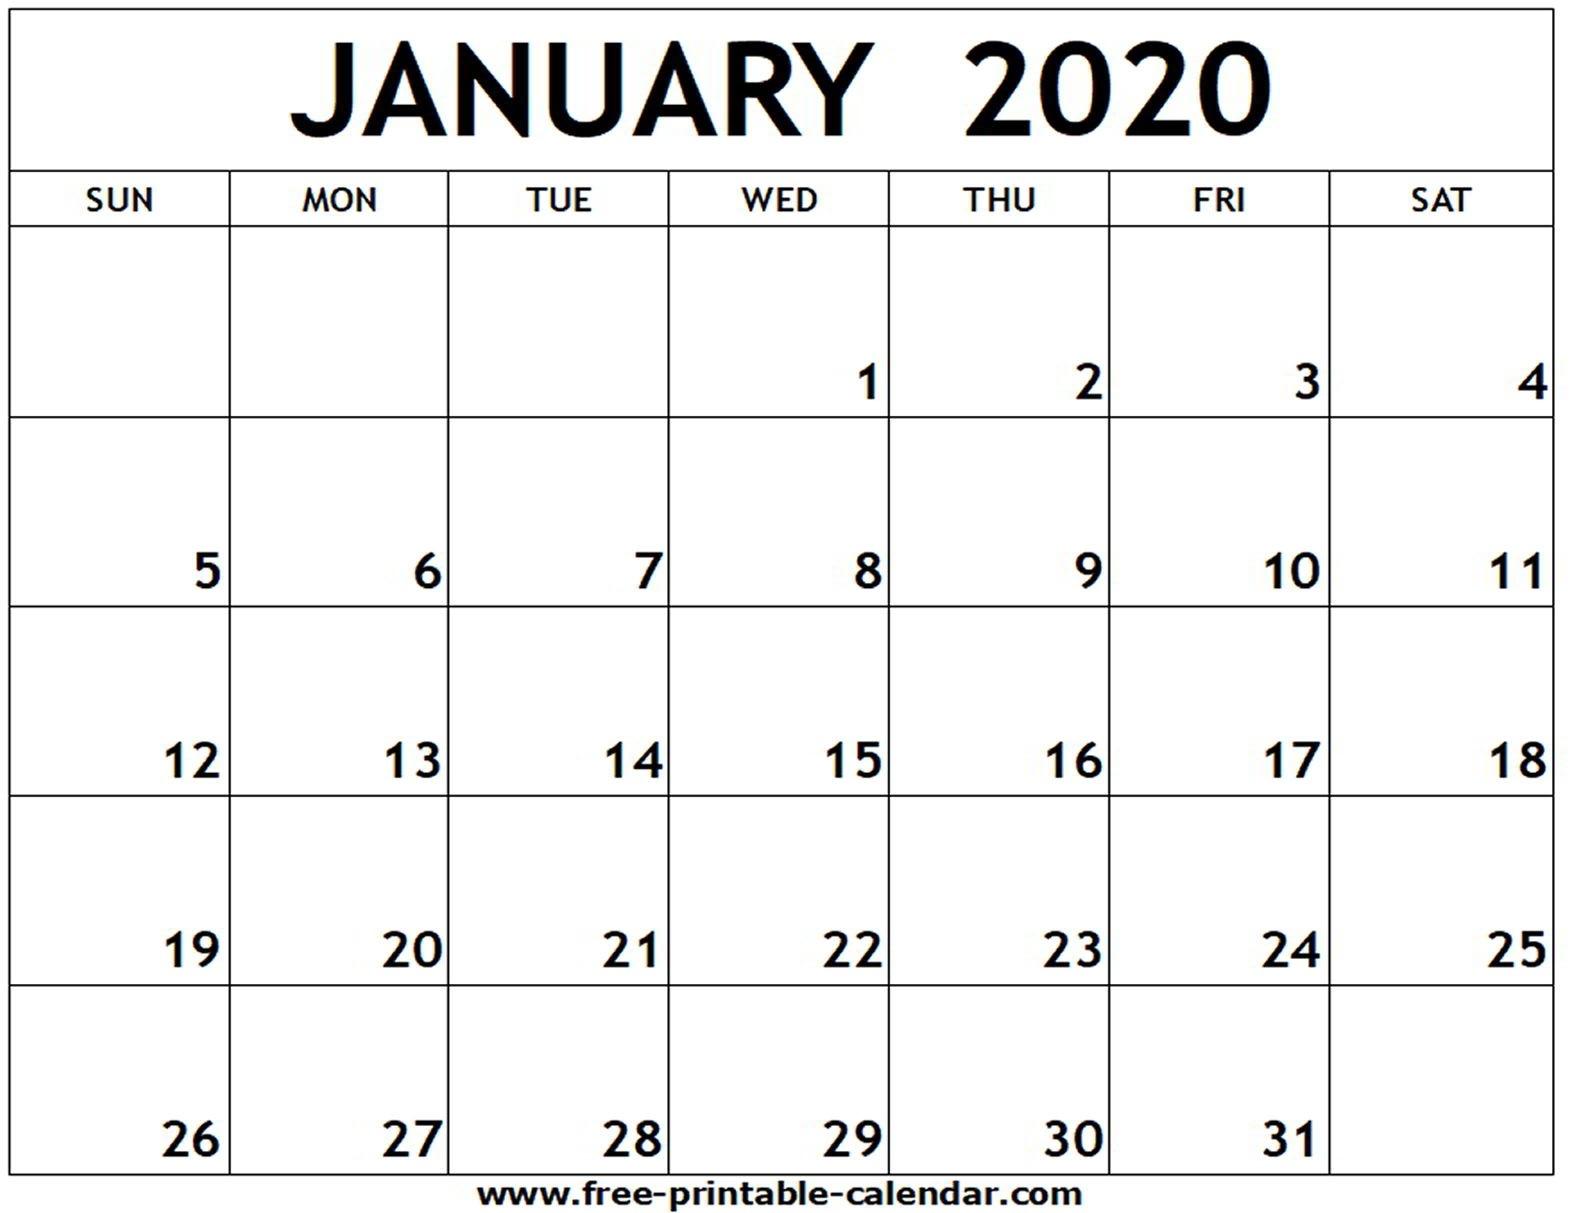 January 2020 Printable Calendar - Free-Printable-Calendar-January 2020 Calendar Australia